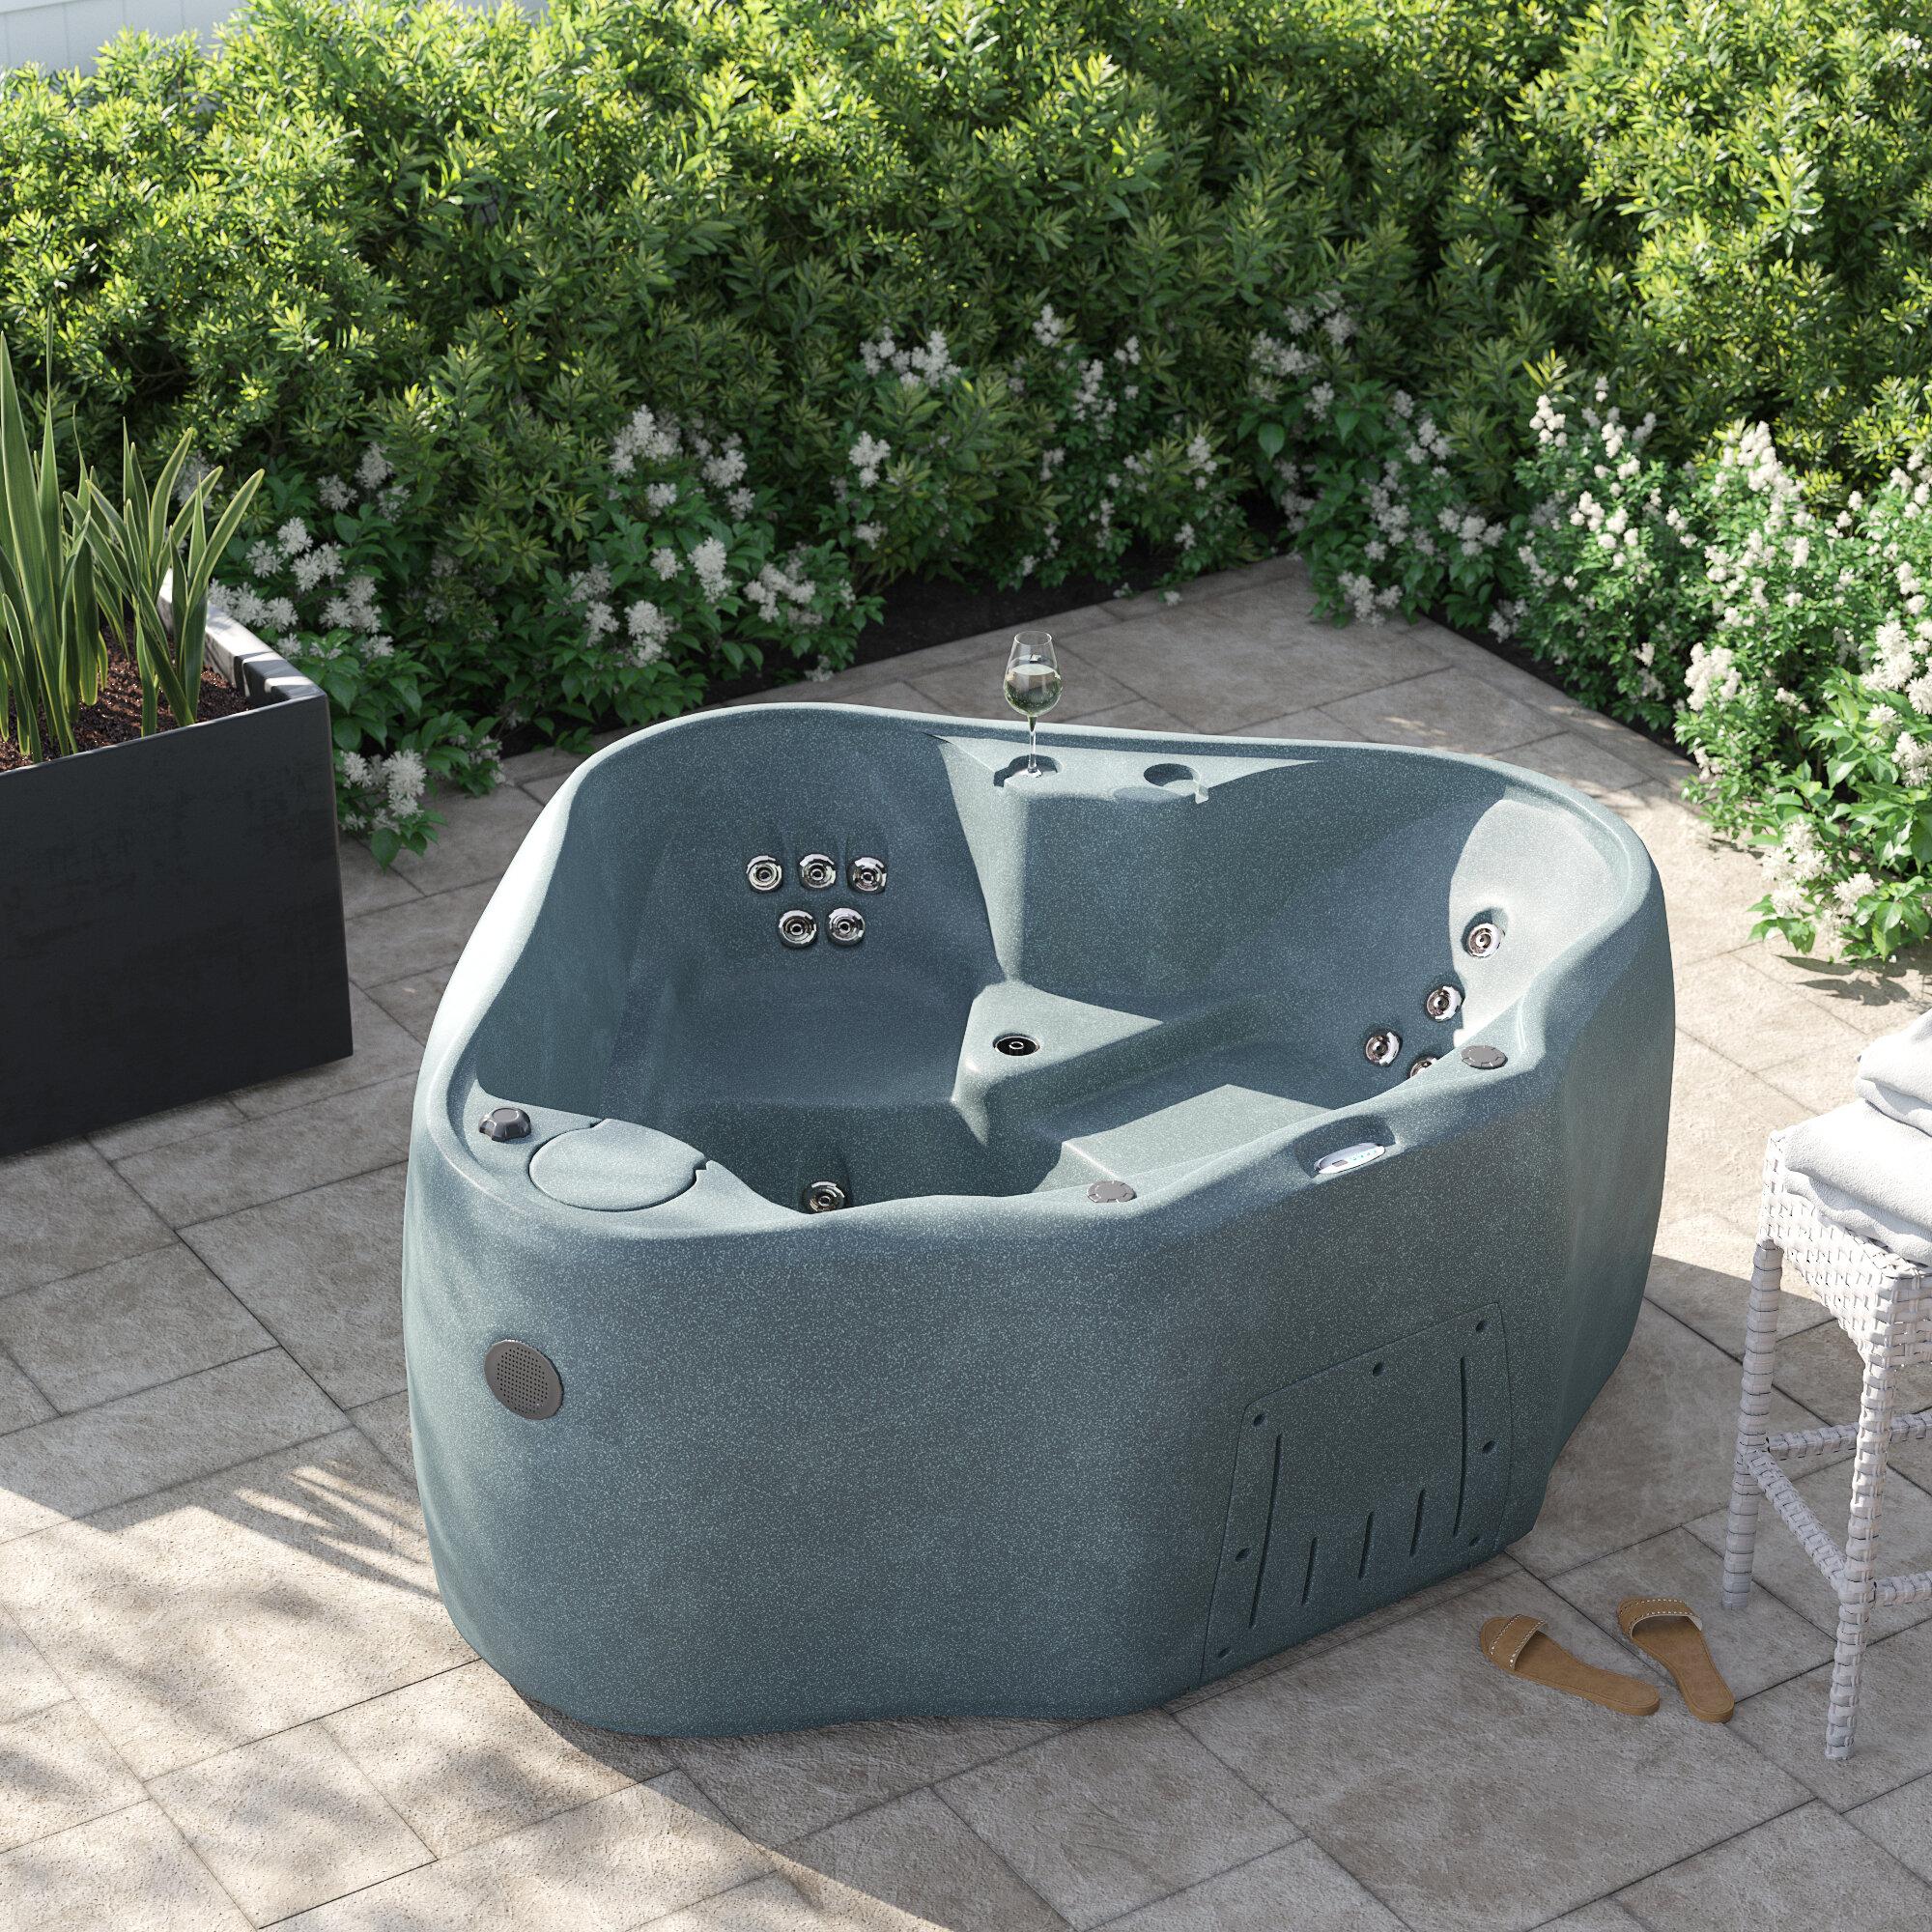 Aquarest Spas Select 300 2 Person 20 Jet Plug And Play Hot Tub